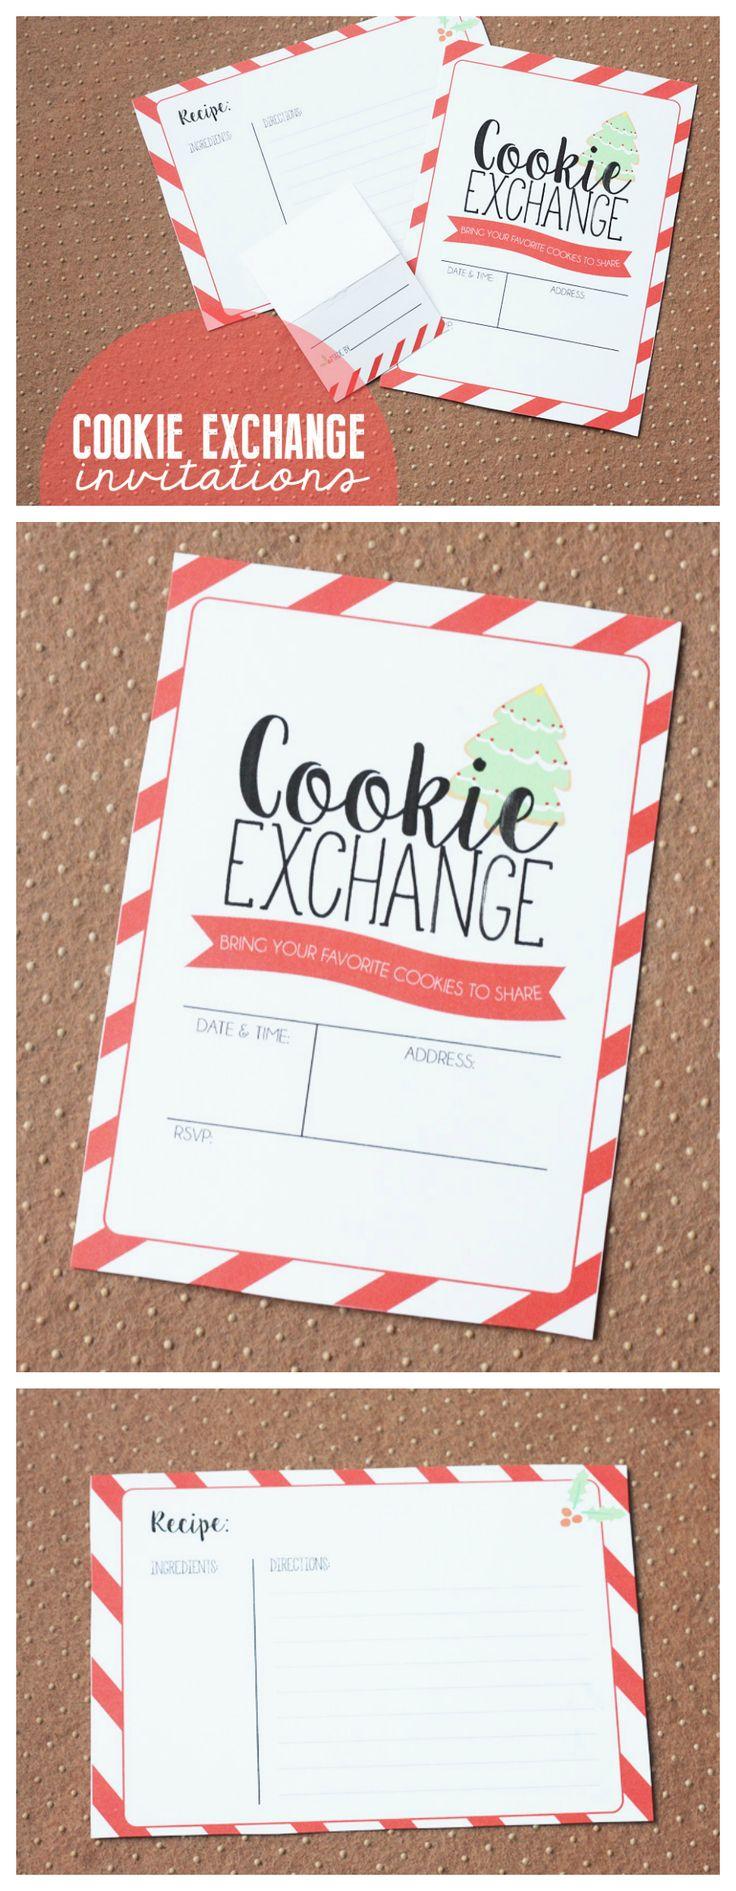 Cookie Exchange Invitation   Cookie Exchange Party Ideas